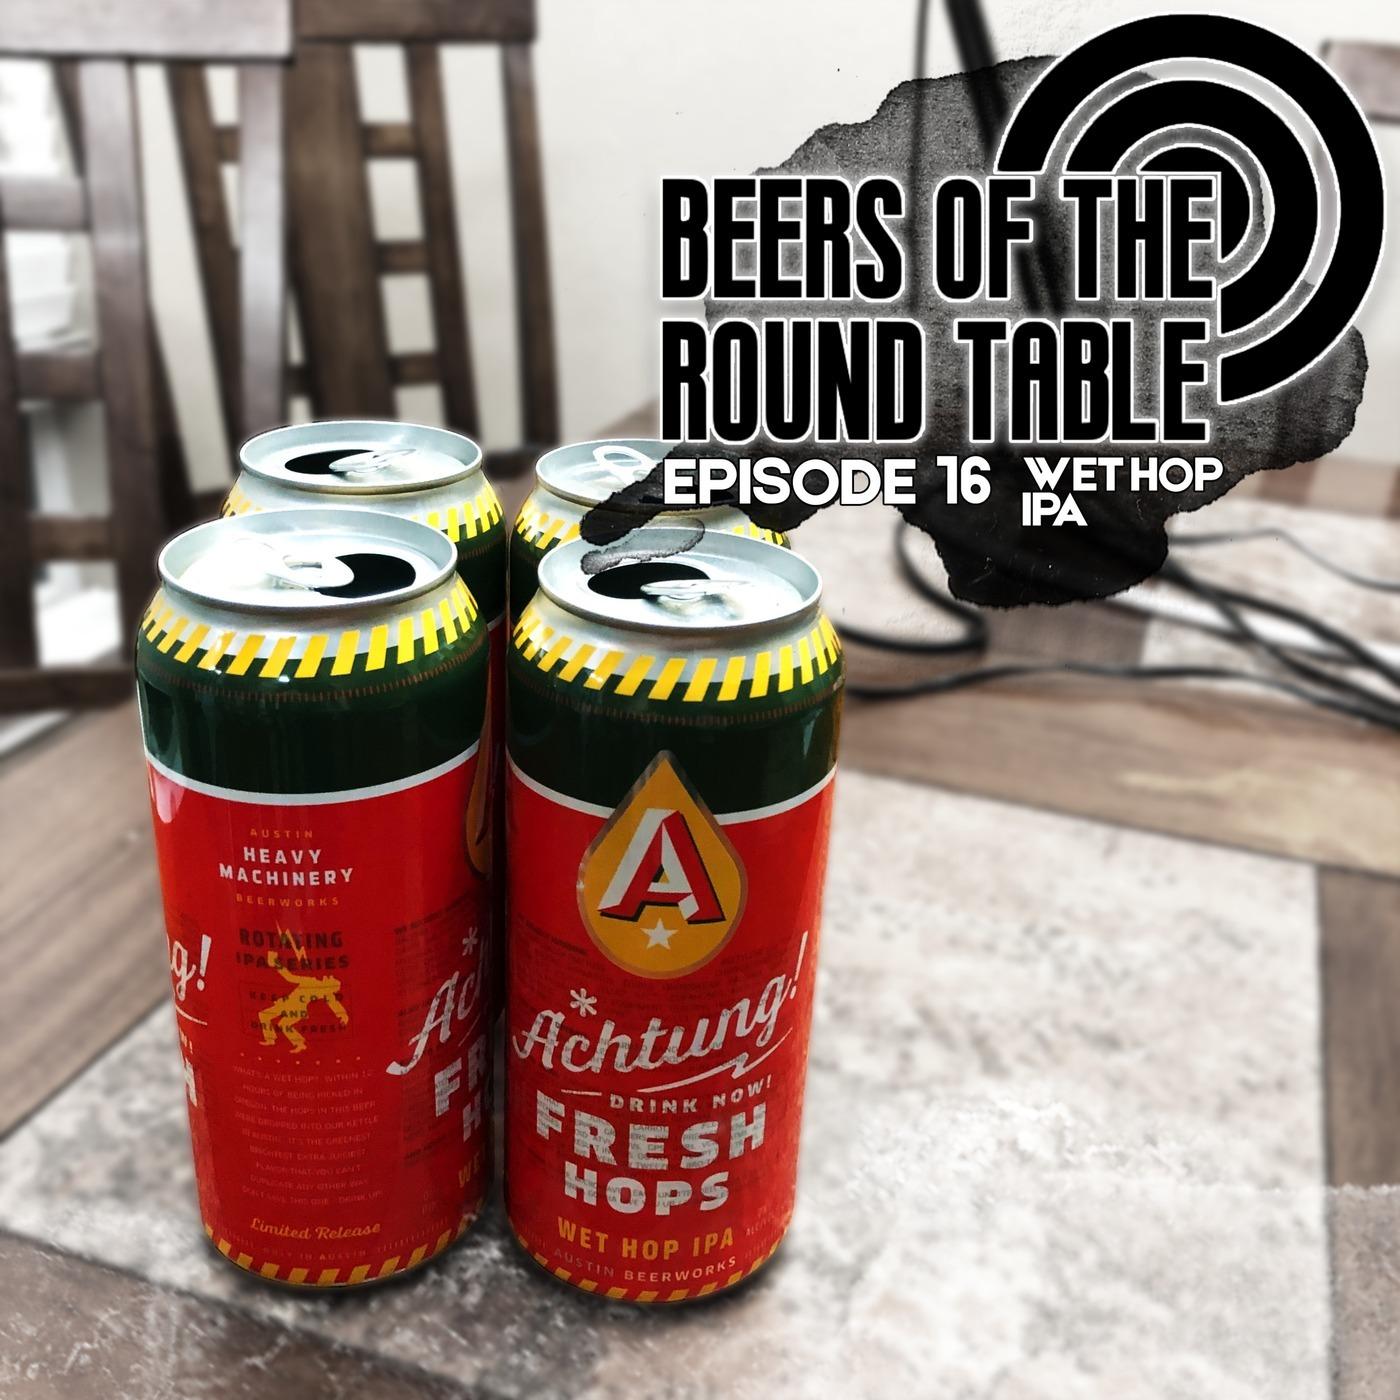 Beers of the Round Table Episode 16: Austin Beerworks Wet